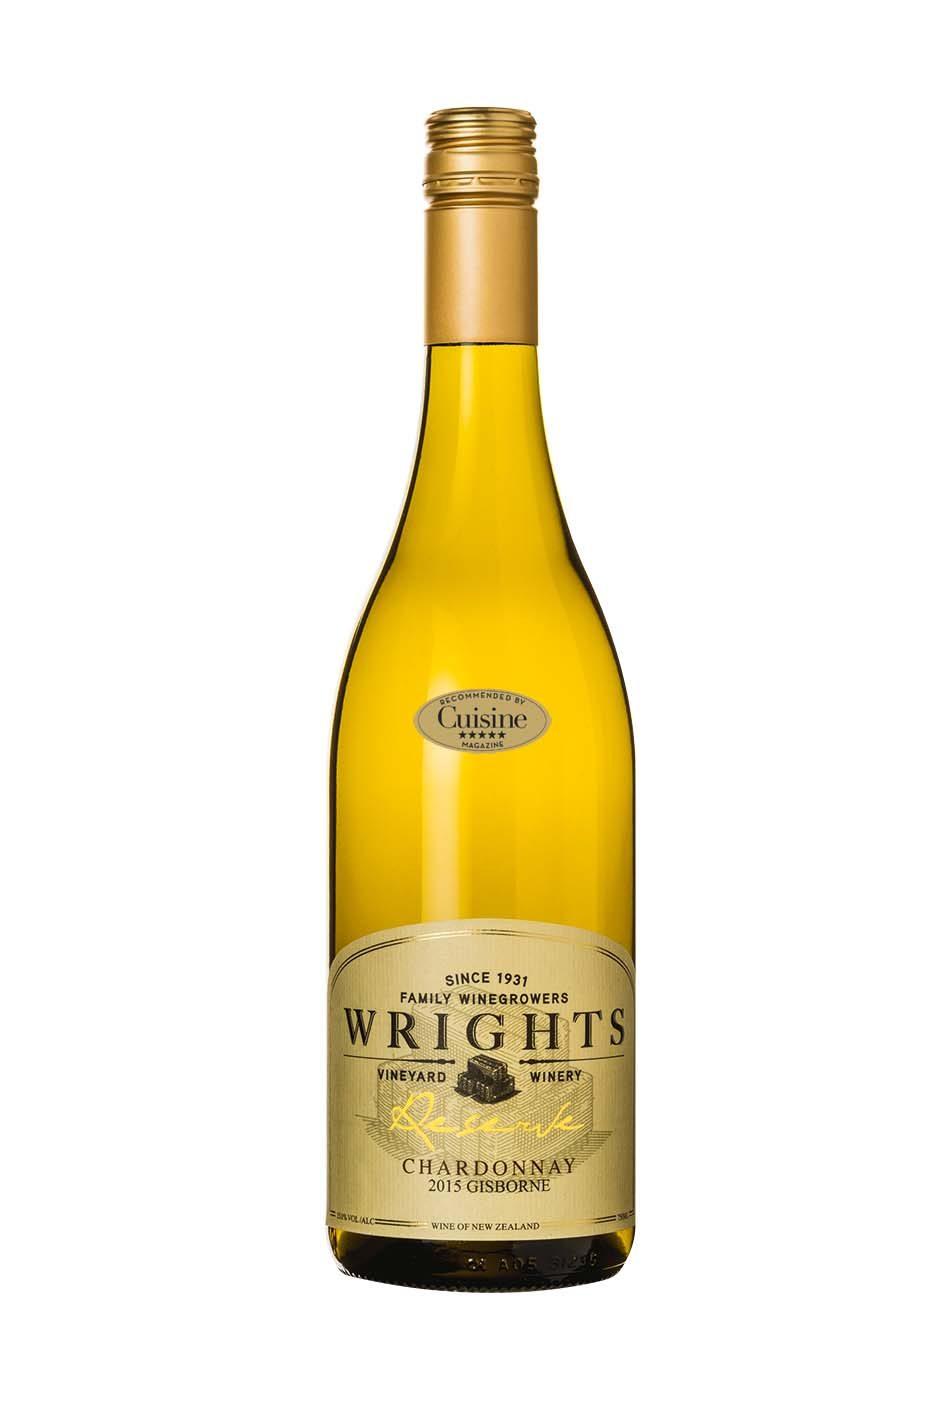 Wrights Reserve Gisborne Chardonnay 2015